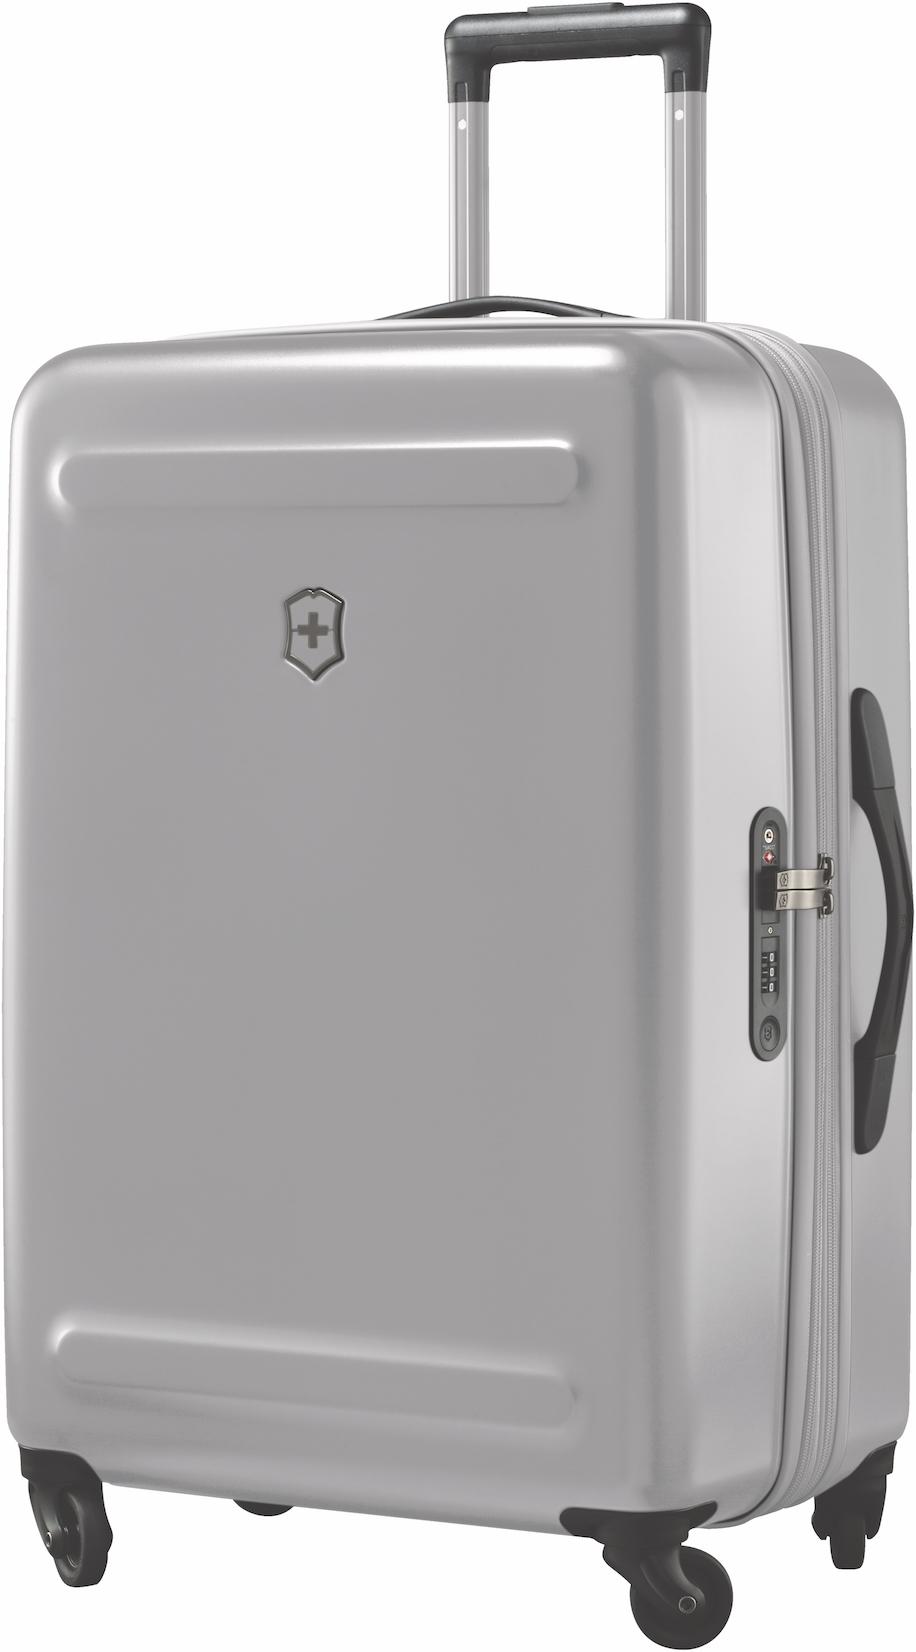 Luggage Review Victorinox Etherius Medium Case Business